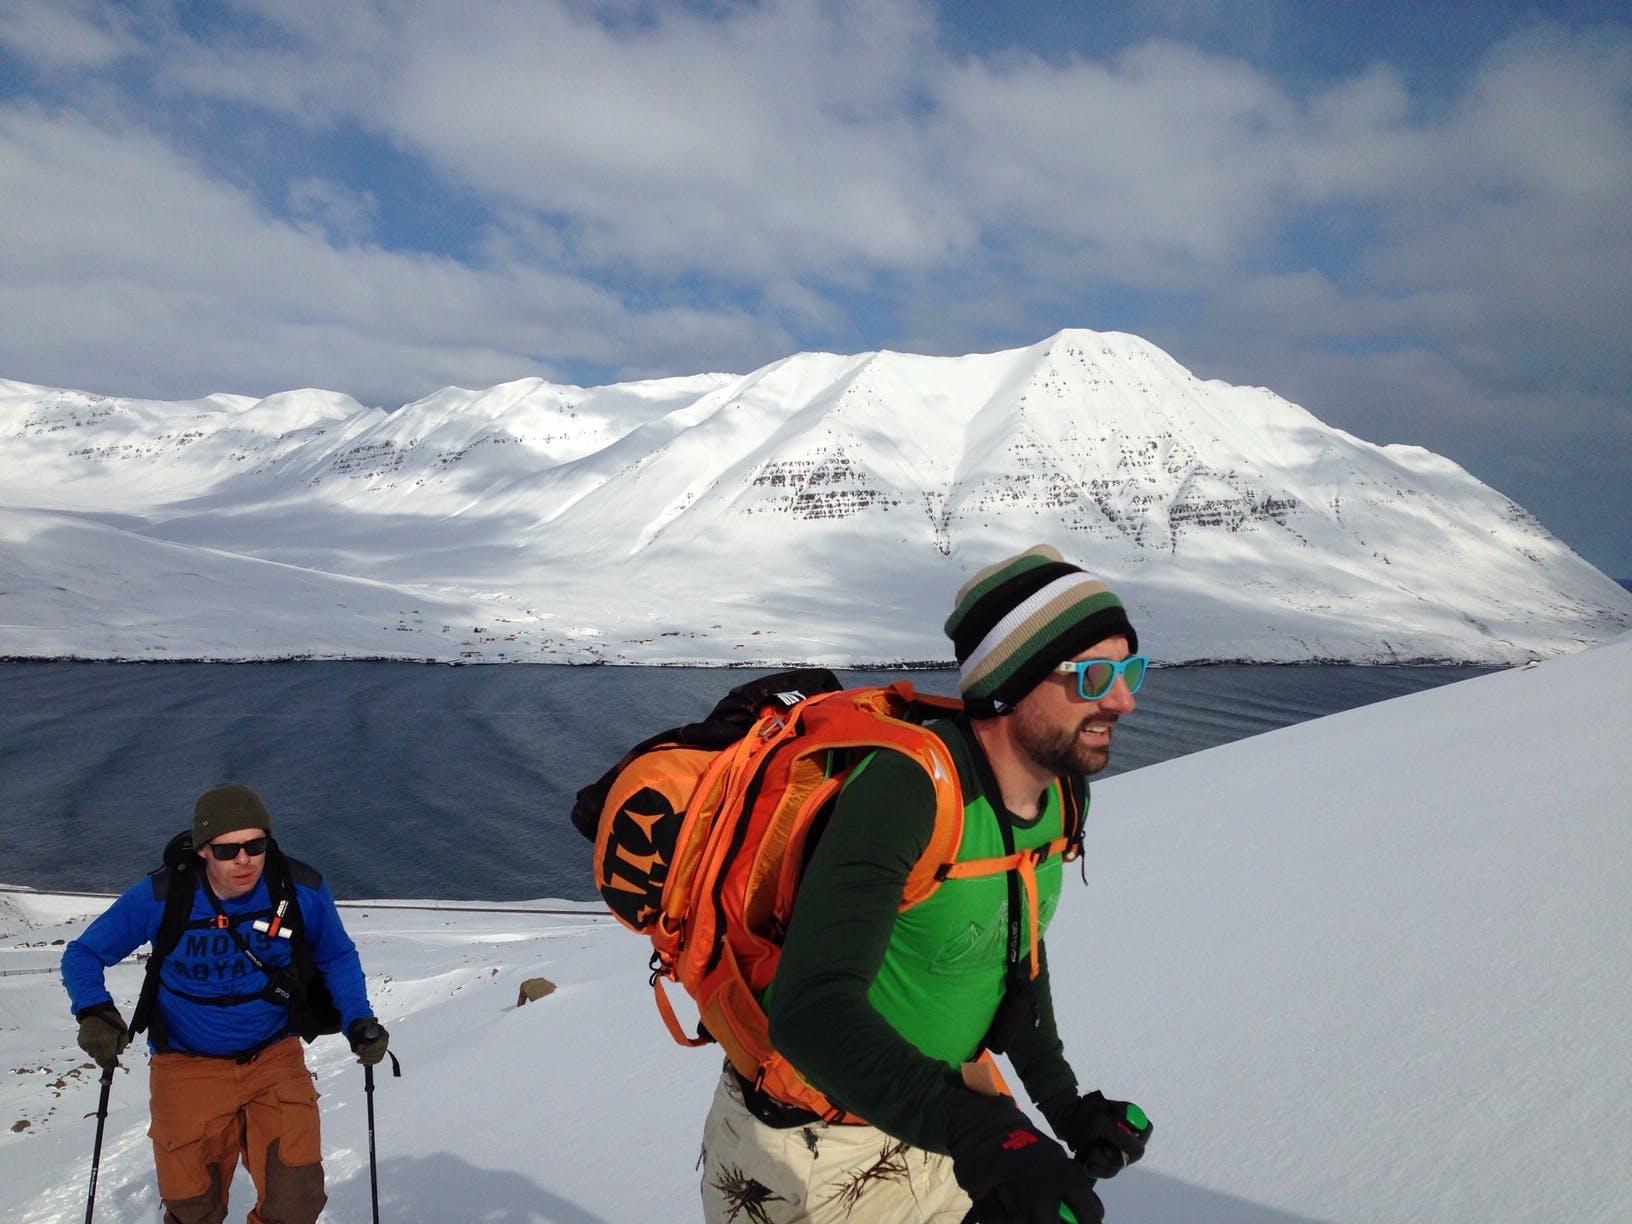 Splitboarders hiking next to sea Iceland